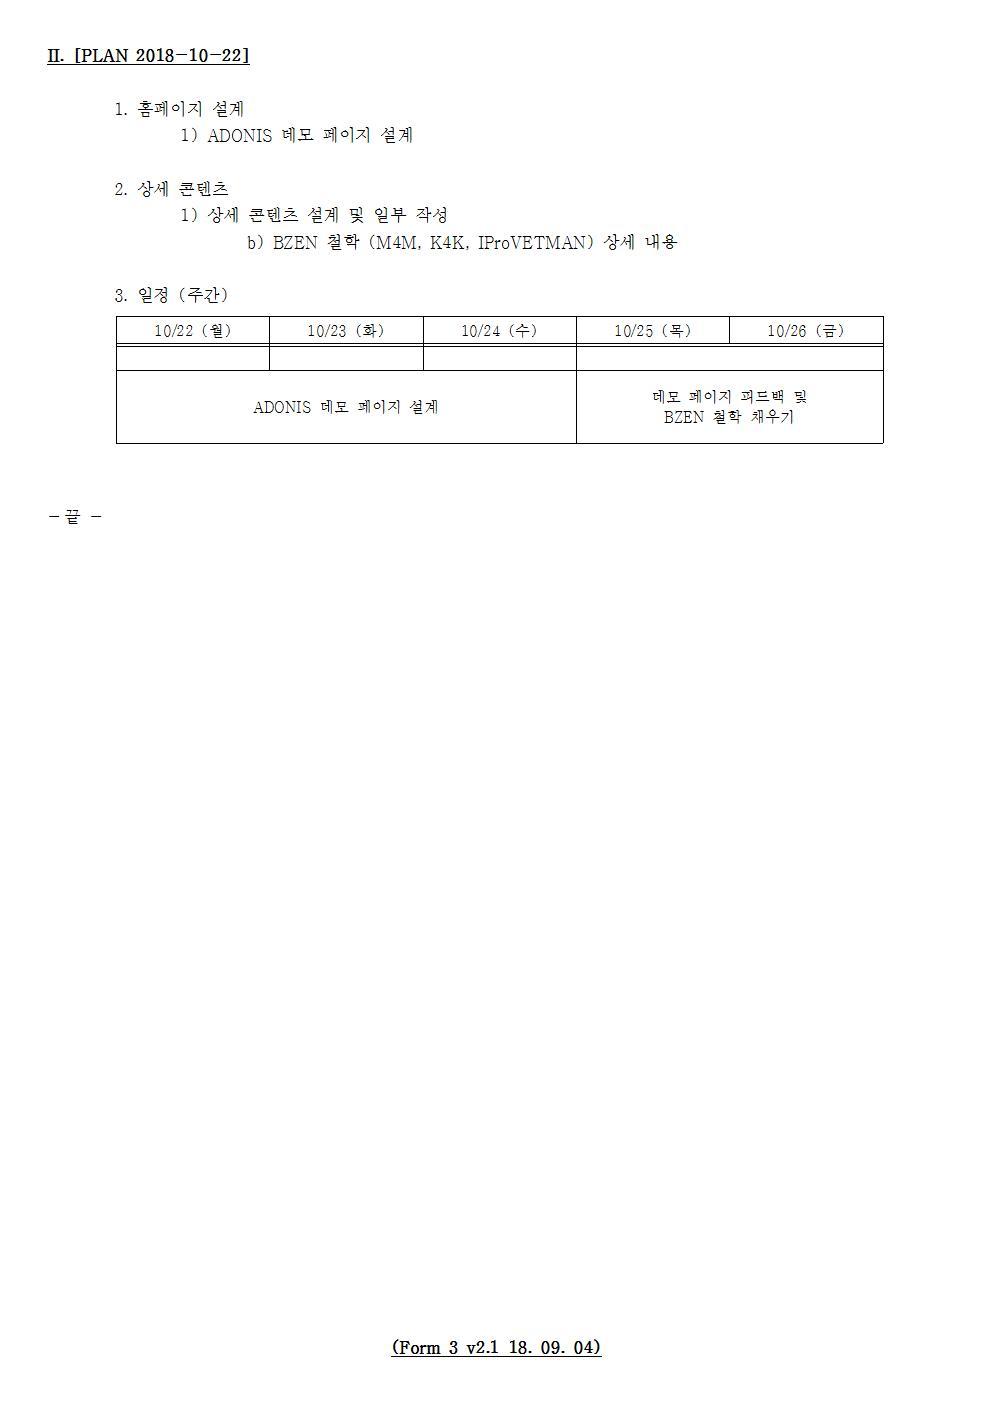 D-[18-047-BZ-07]-[BZEN HP v3.0]-[2018-10-22][HH]002.jpg